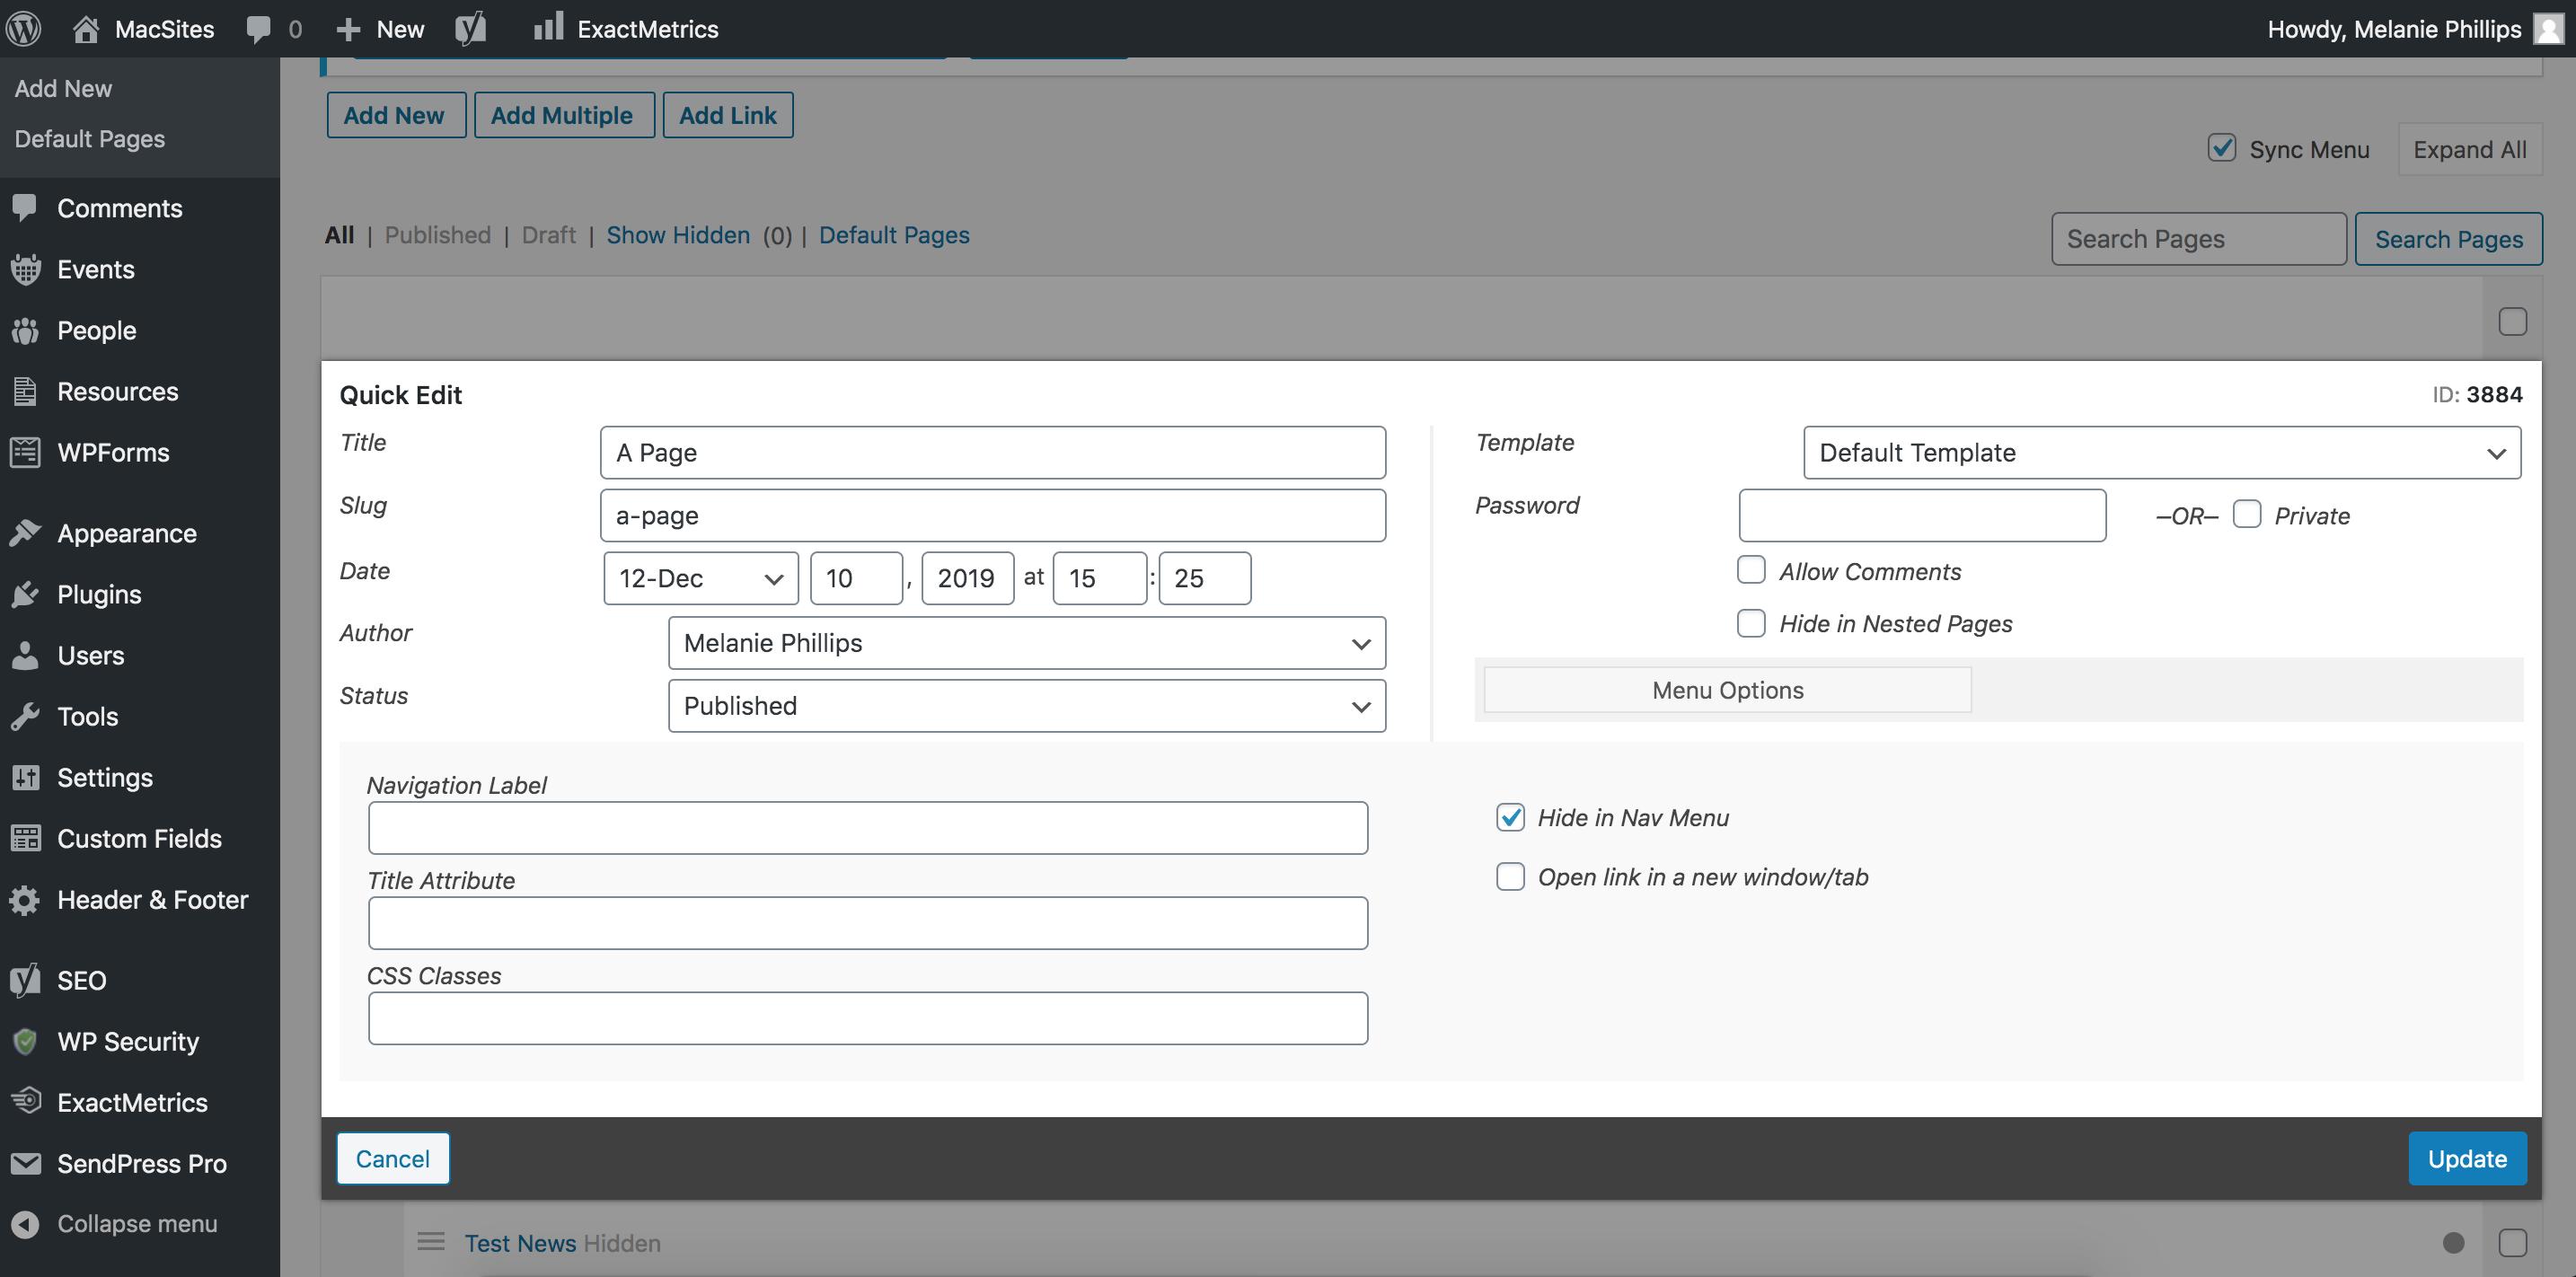 screenshot showing the Quick Edit window opened